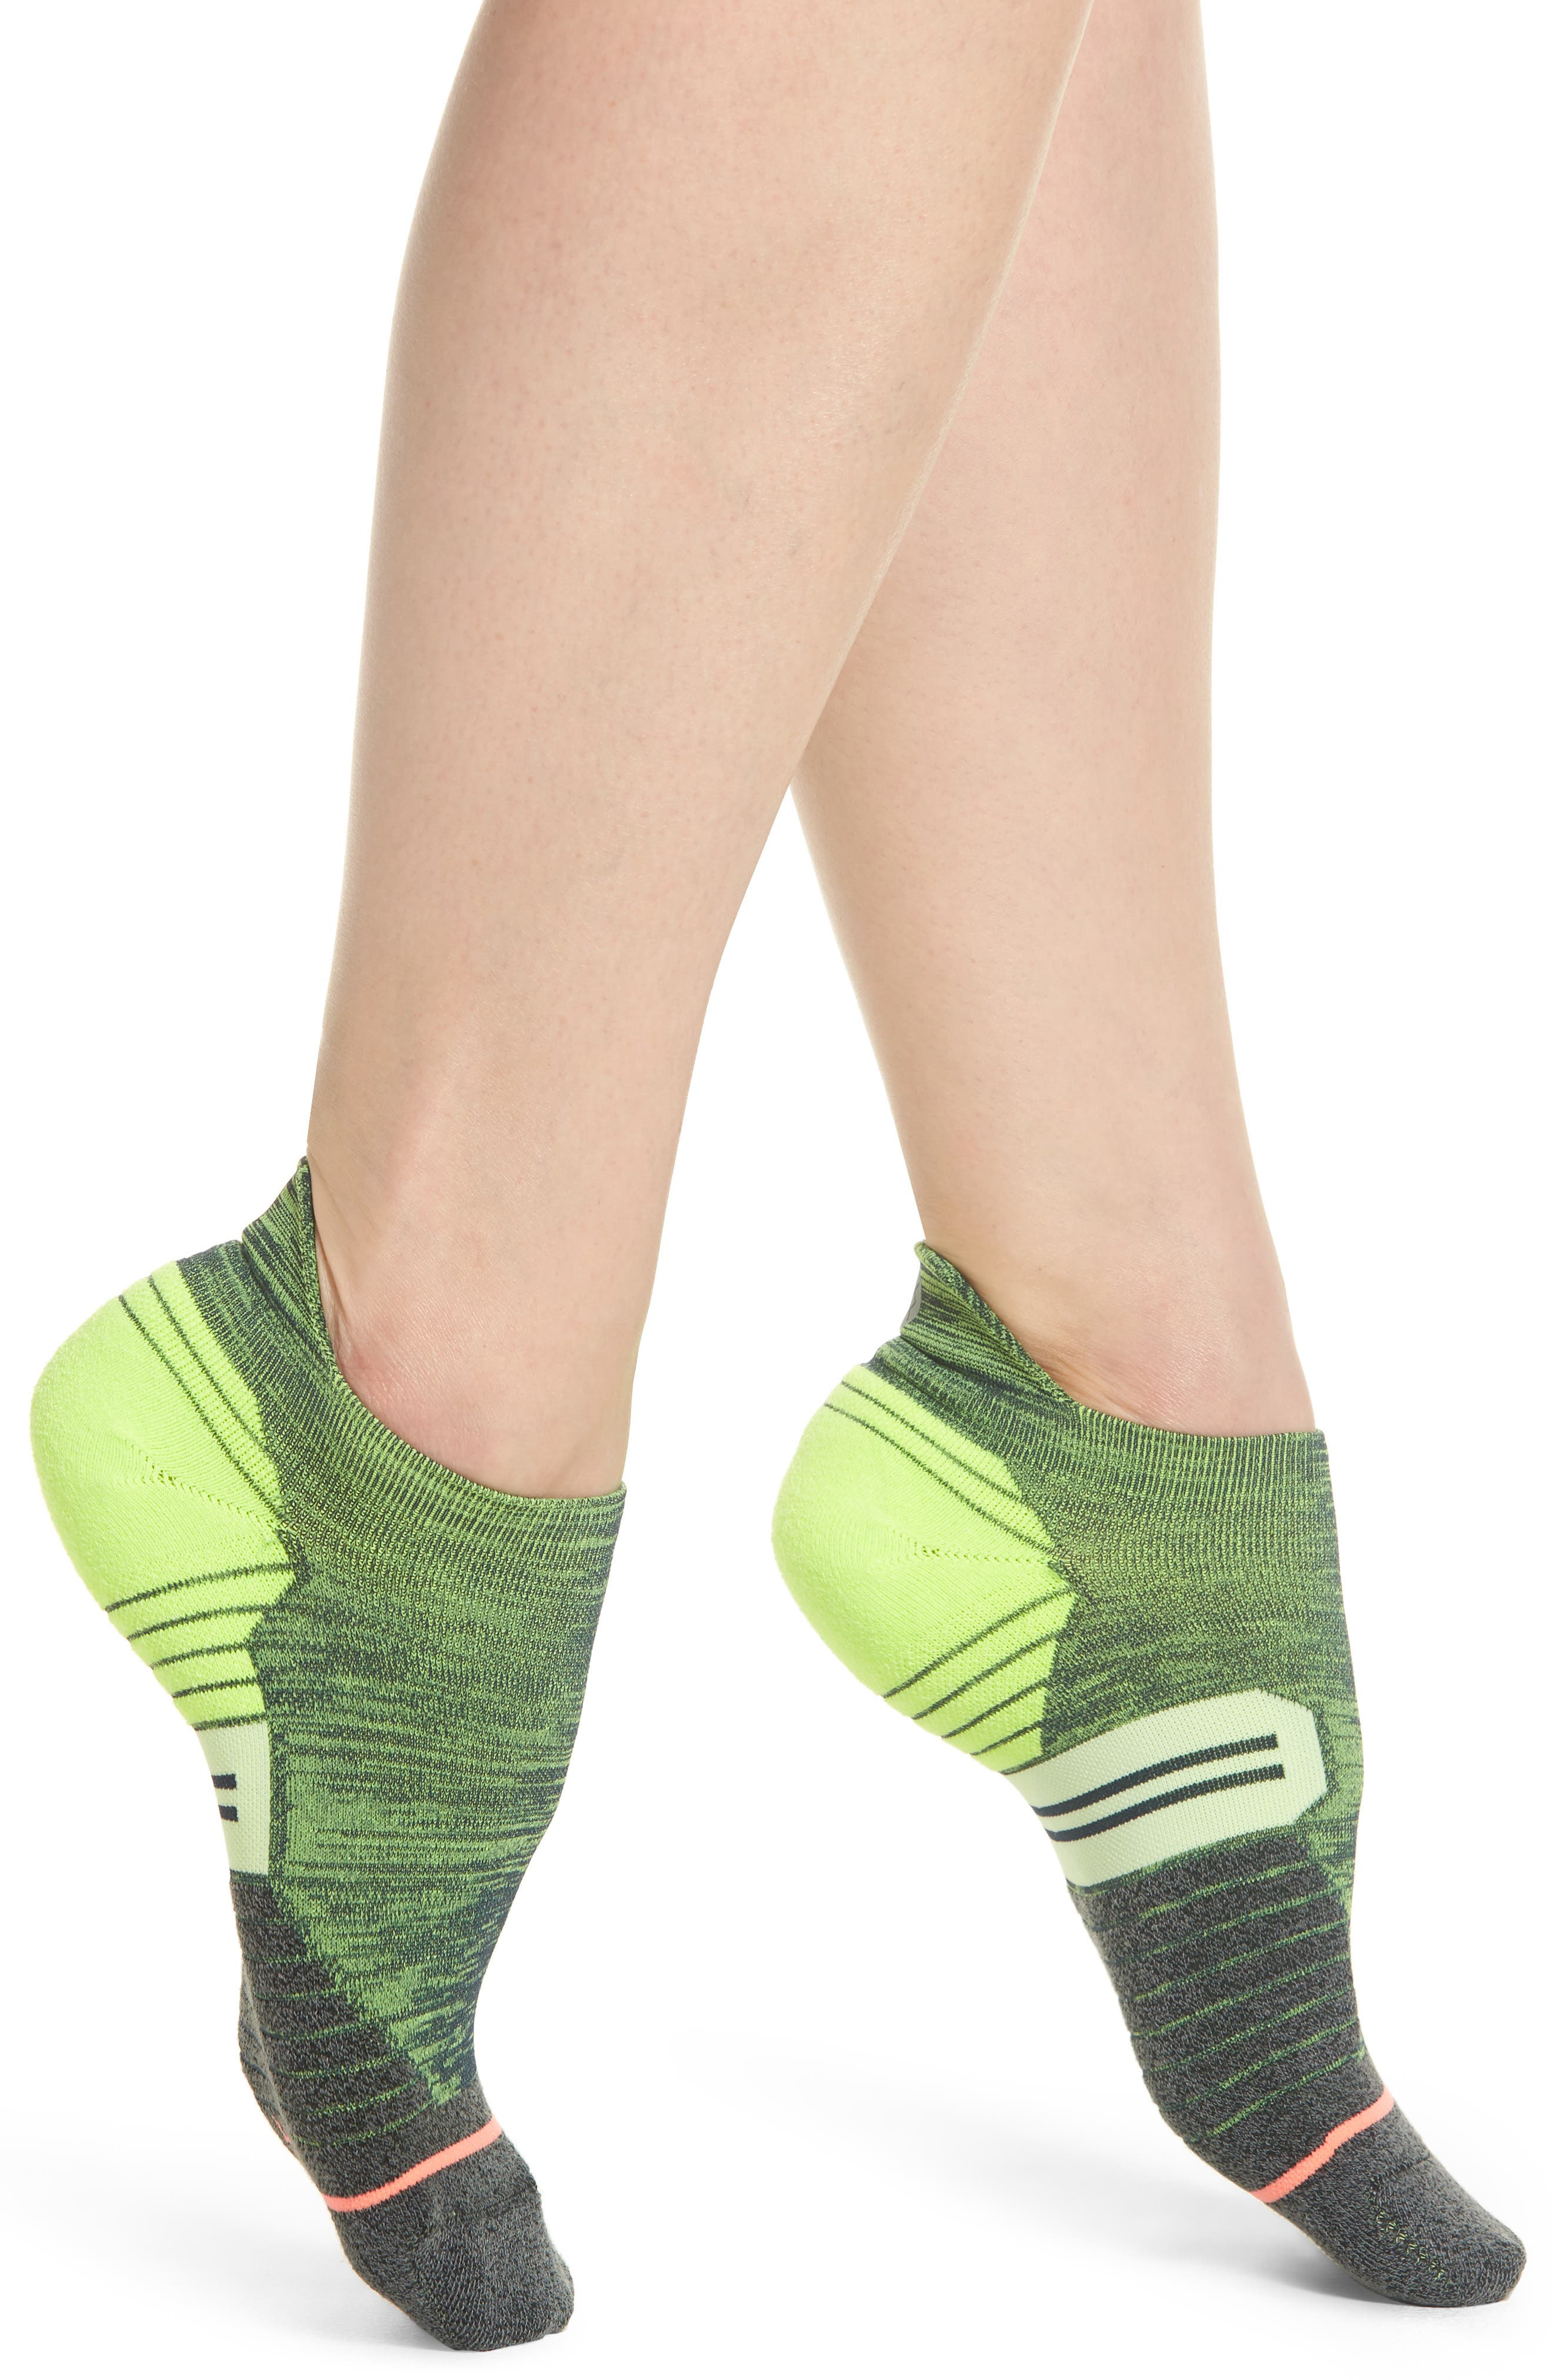 Distance Tab Running Socks,                             Main thumbnail 1, color,                             300